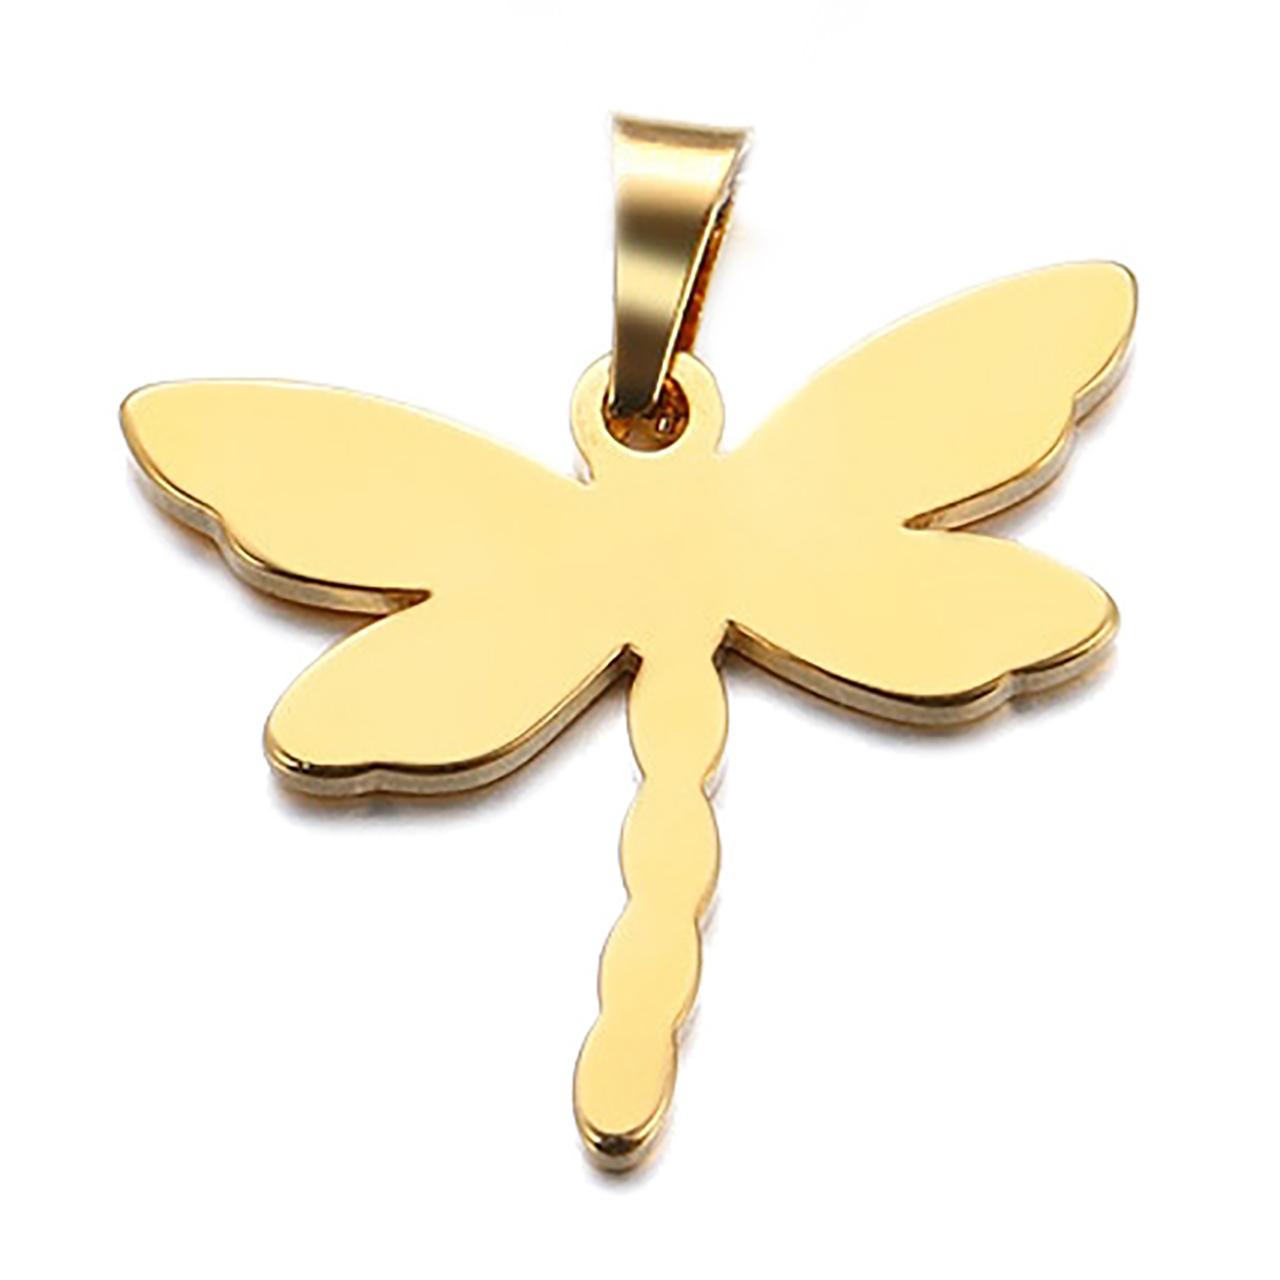 آویز گردنبند طلا 18 عیار جواهری میکا طرح سنجاقک کد 0110051